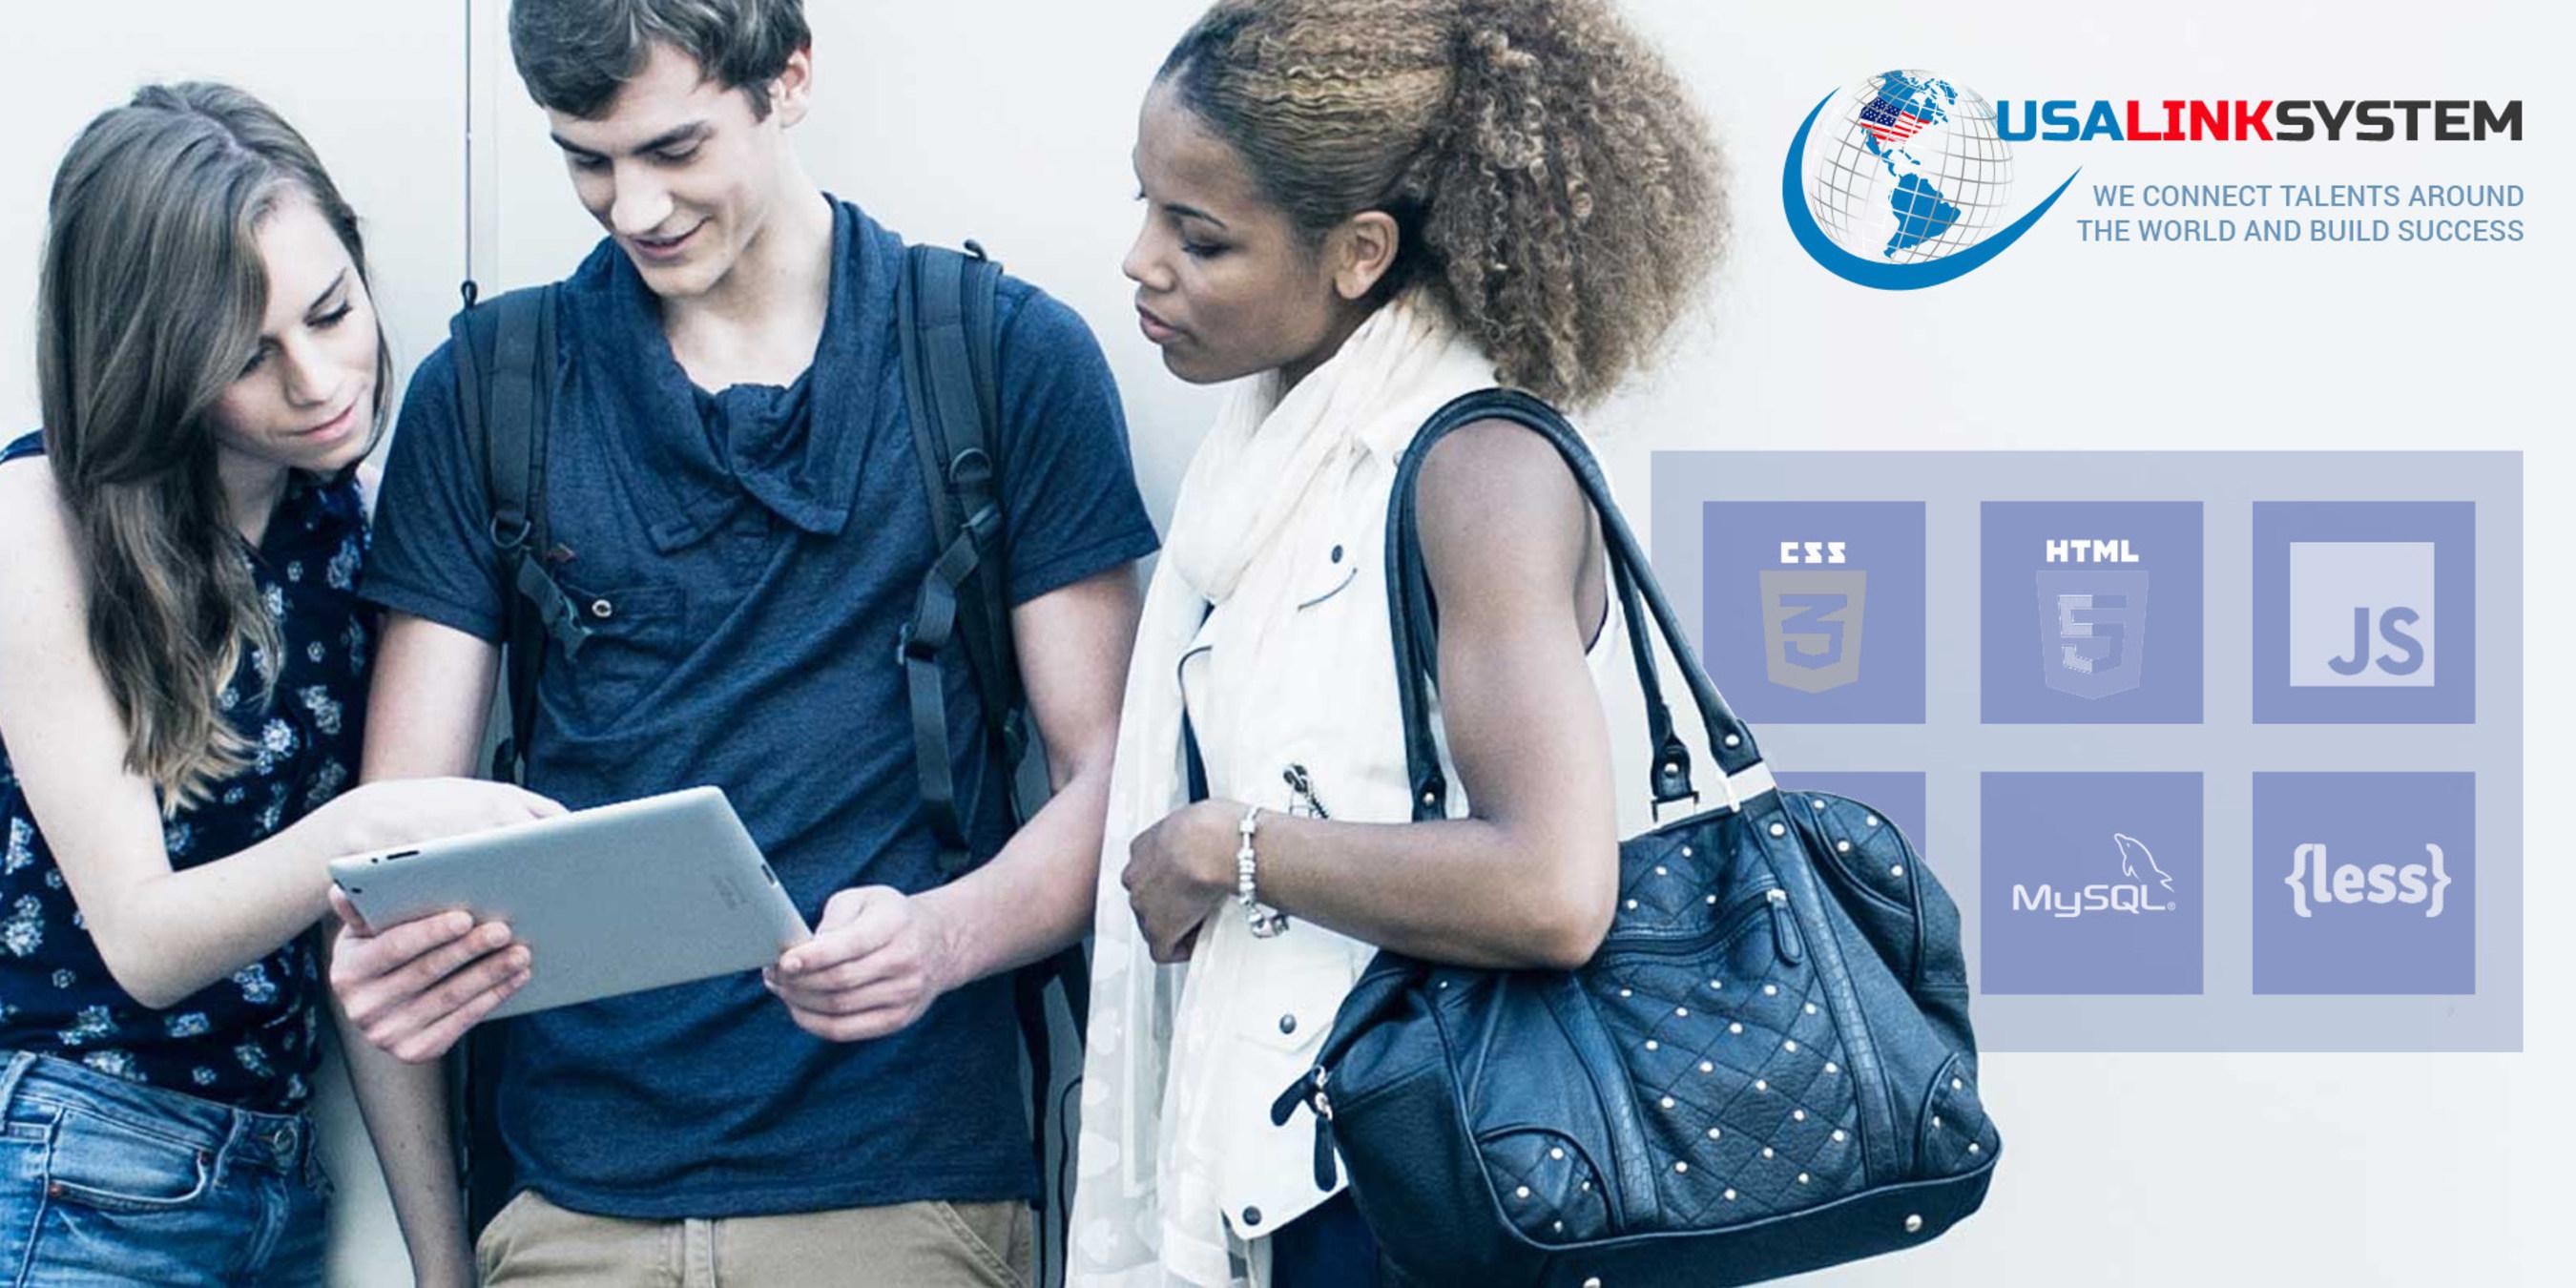 USA Link System establishes student workshops throughout Europe